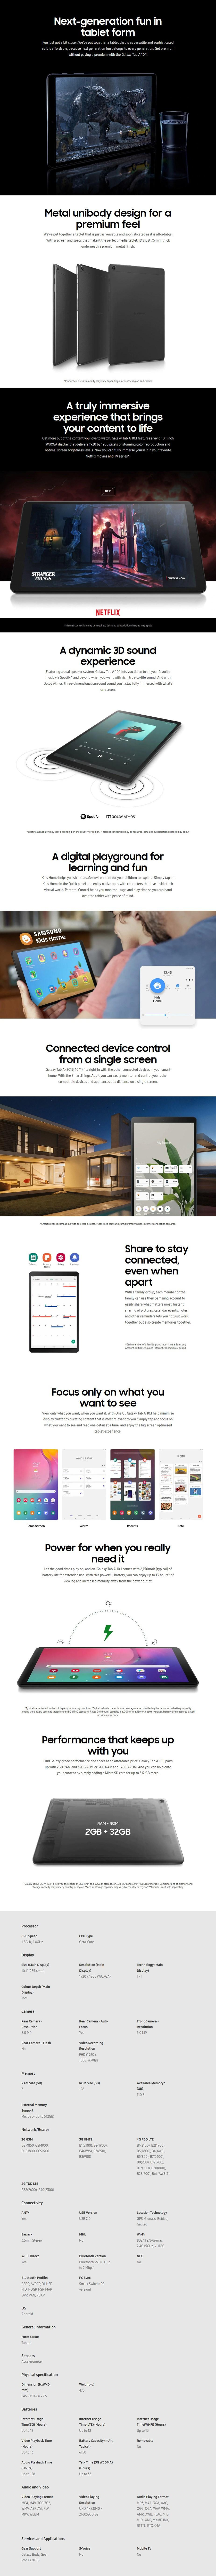 "Samsung Galaxy Tab A 10.1"" 3GB 128GB Wi-Fi 4G - Black - Overview 1"